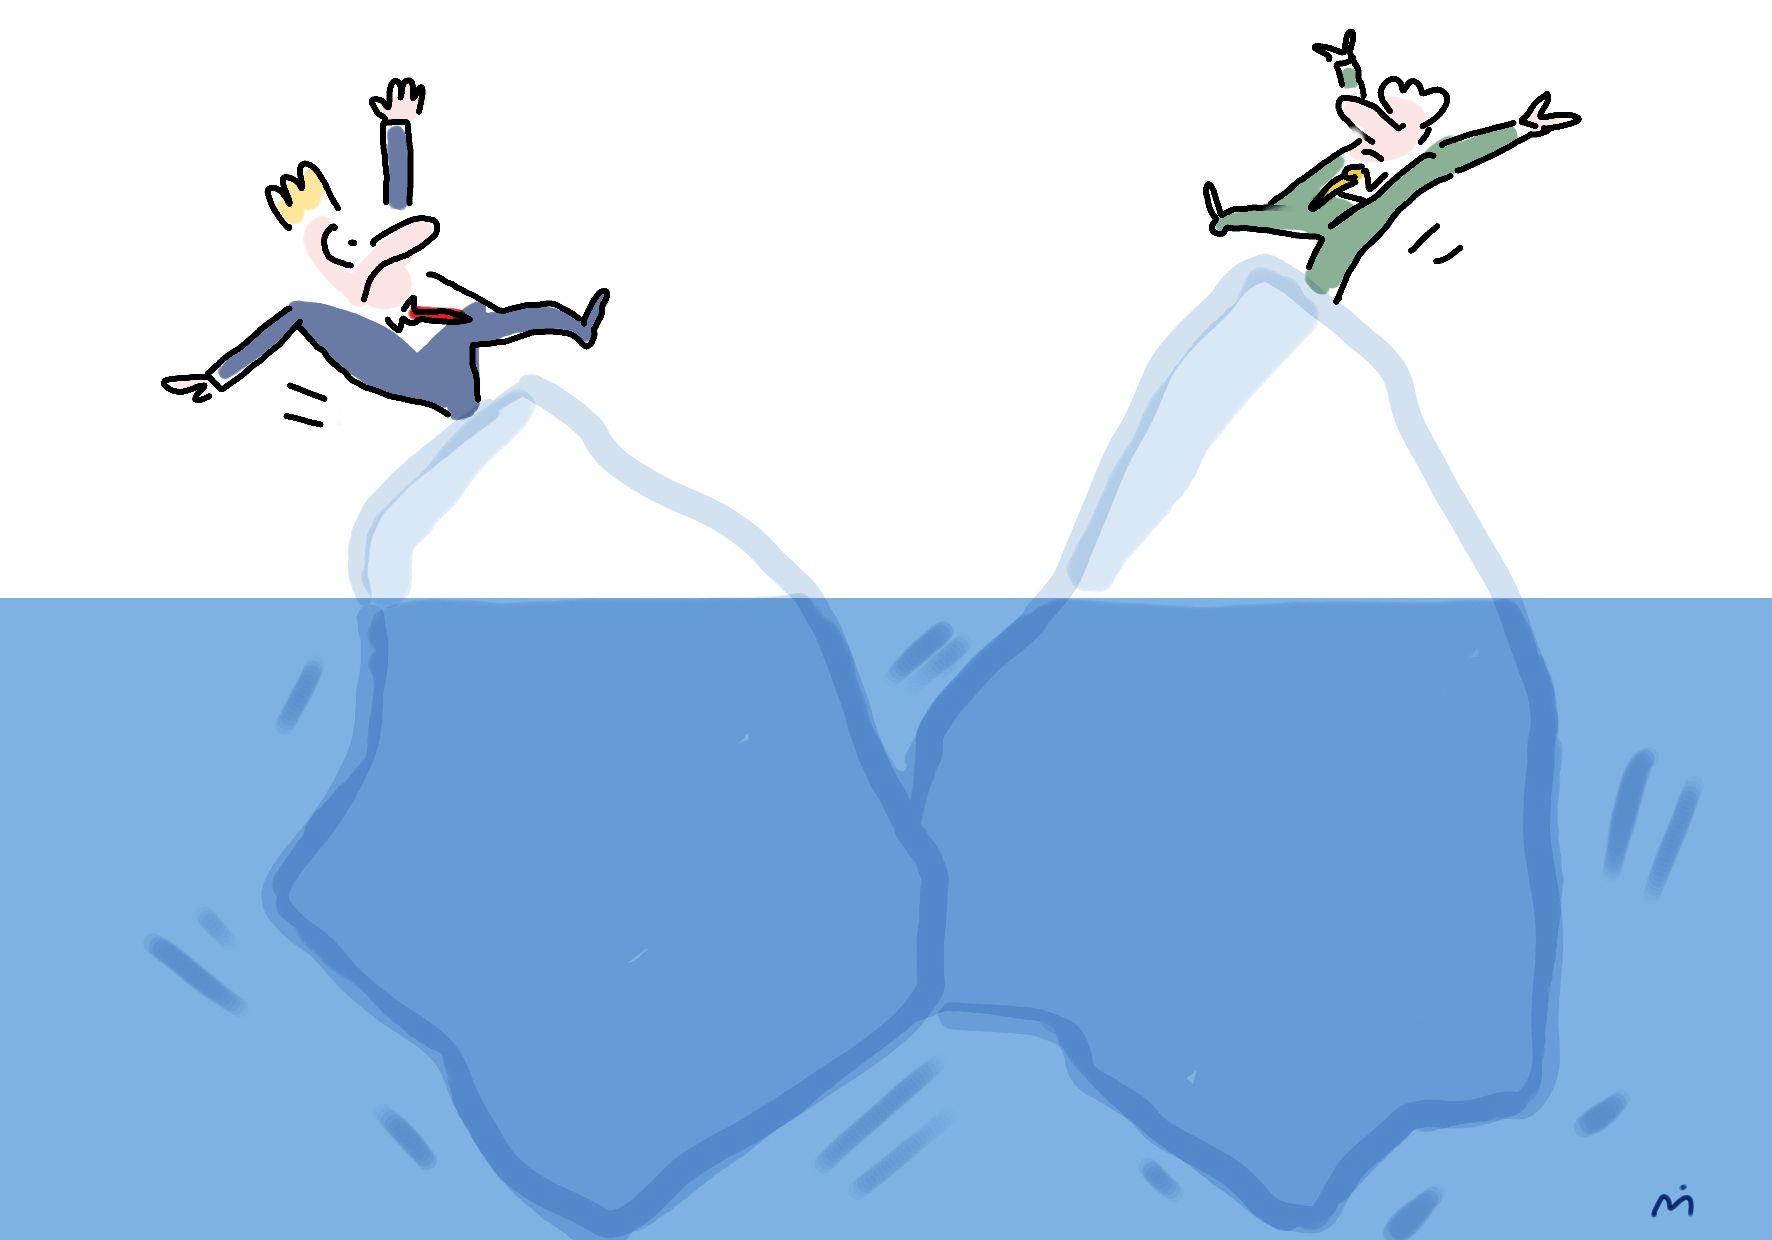 eisberg kollision, barbara wietasch, international dynamics